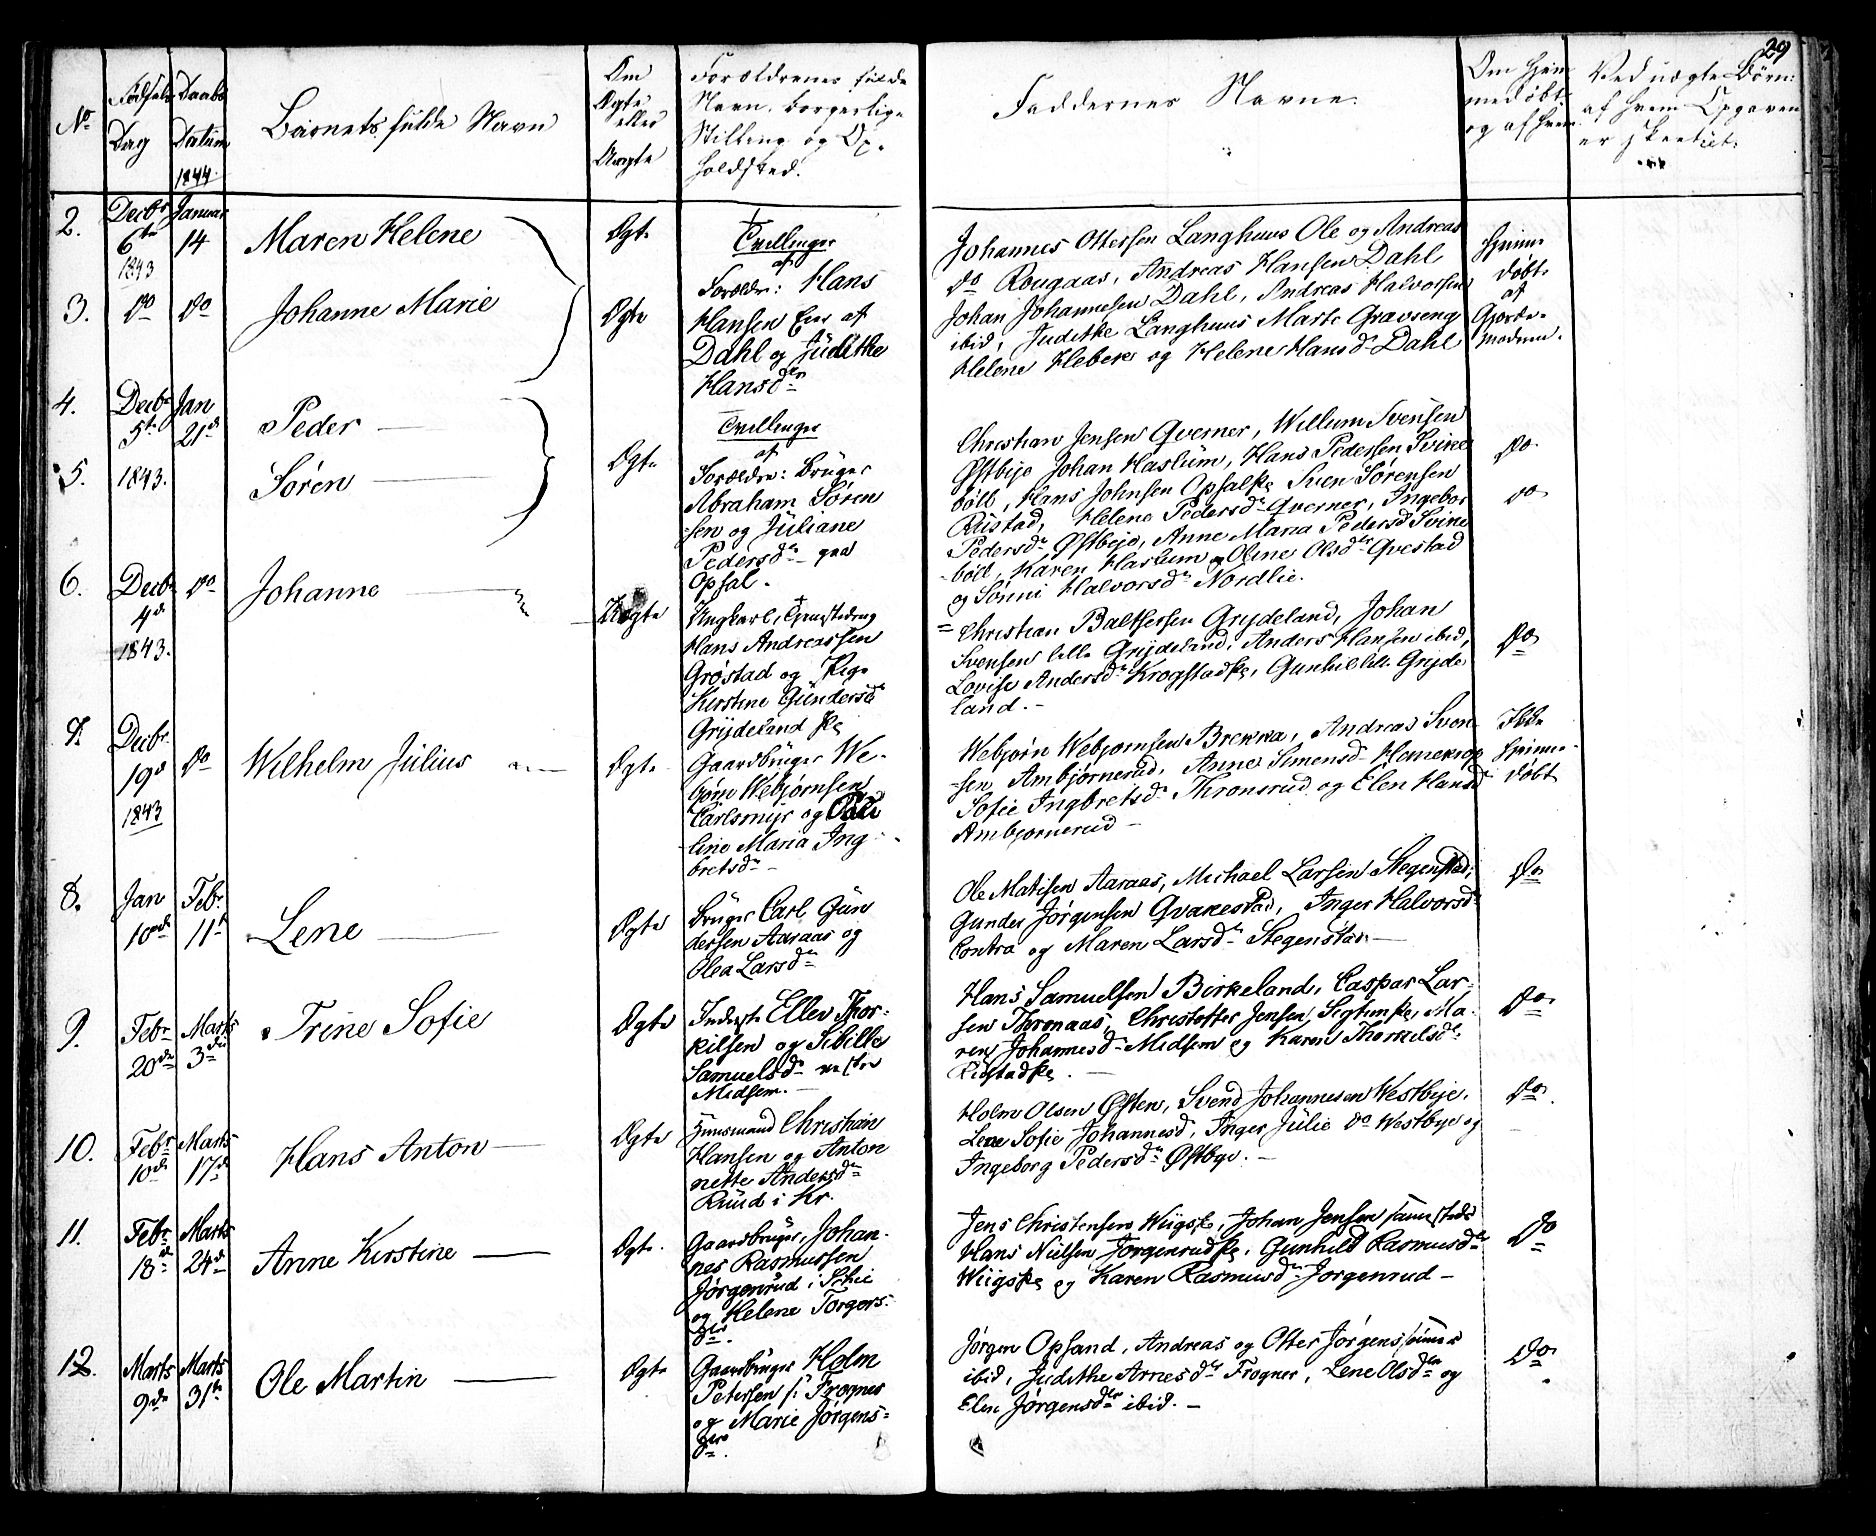 SAO, Kråkstad prestekontor Kirkebøker, F/Fa/L0005: Parish register (official) no. I 5, 1837-1847, p. 29